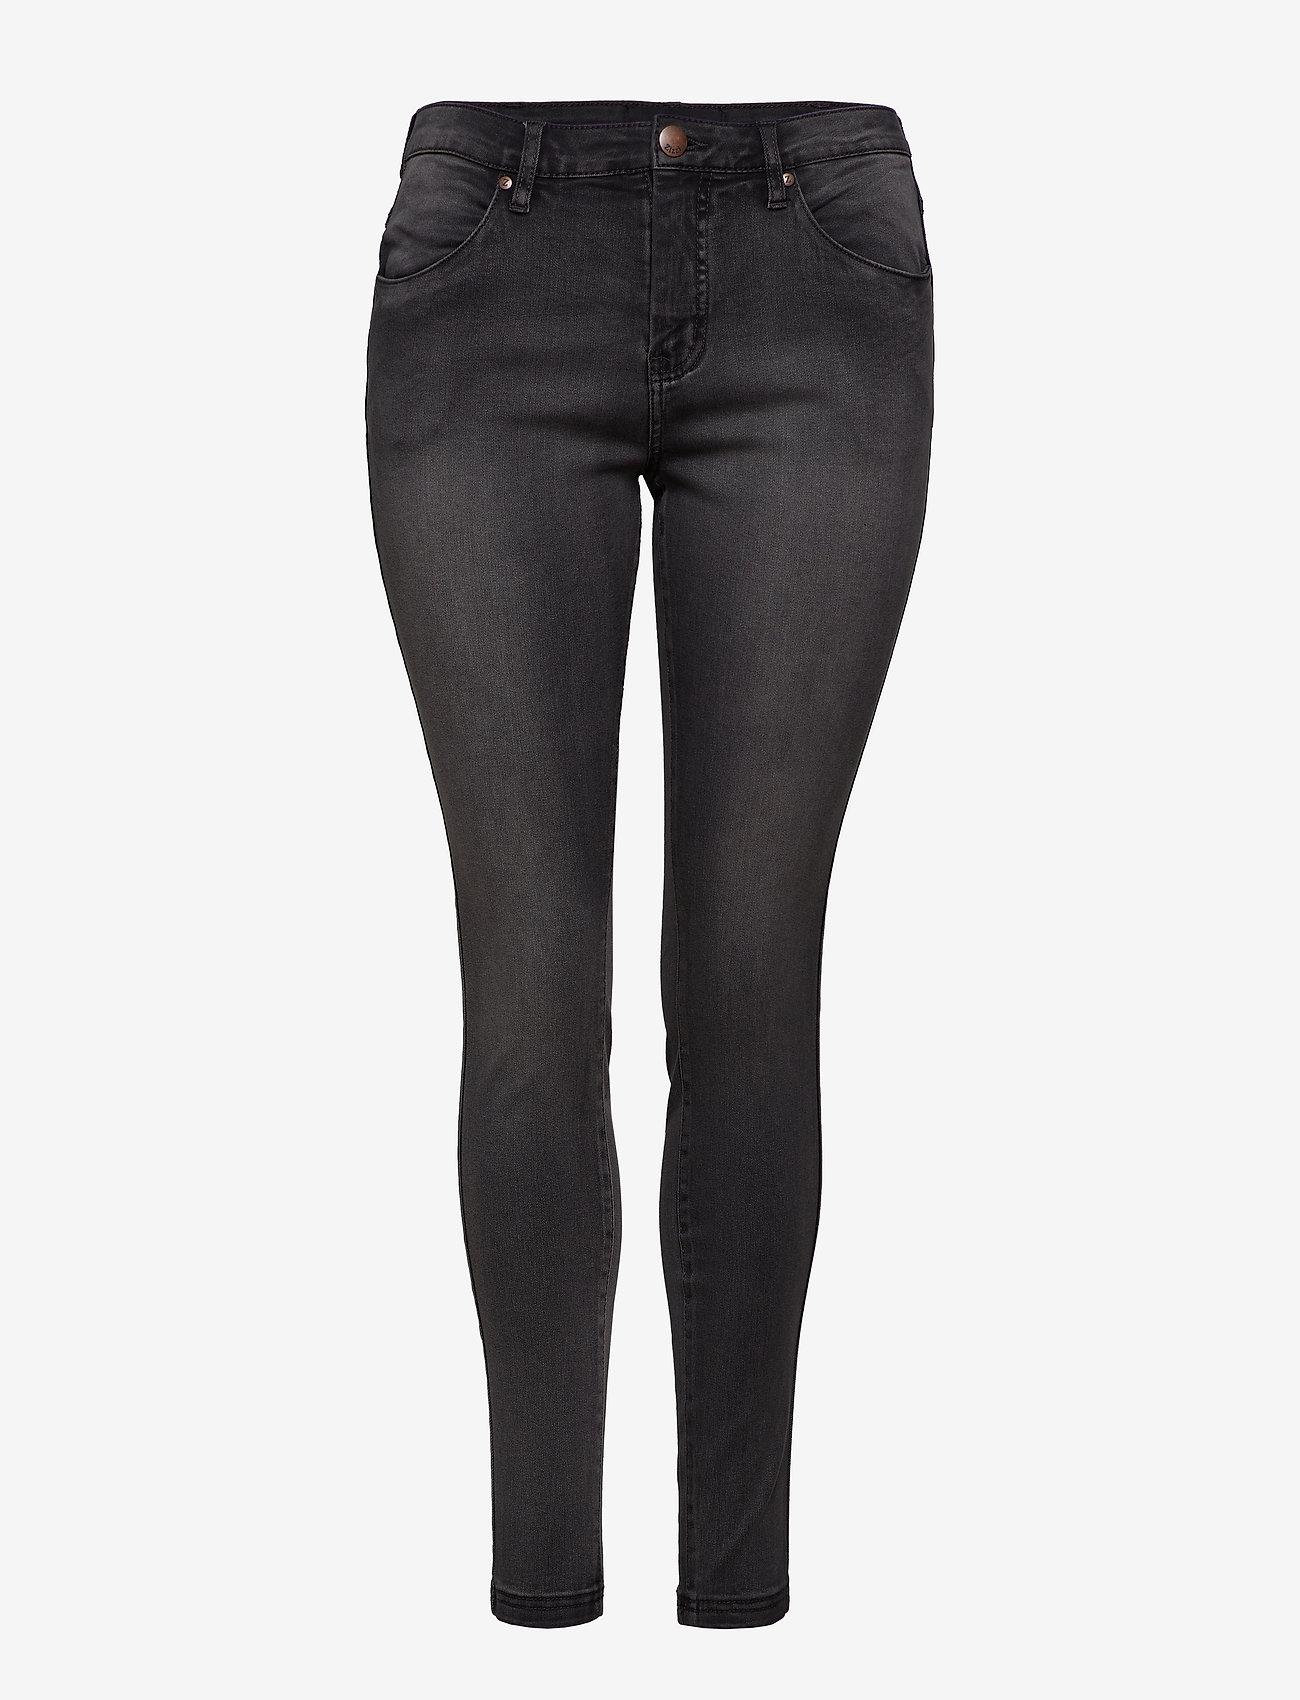 Zizzi Jeans, long, AMY, super slim - Jeans DARK GREY - Damen Kleidung